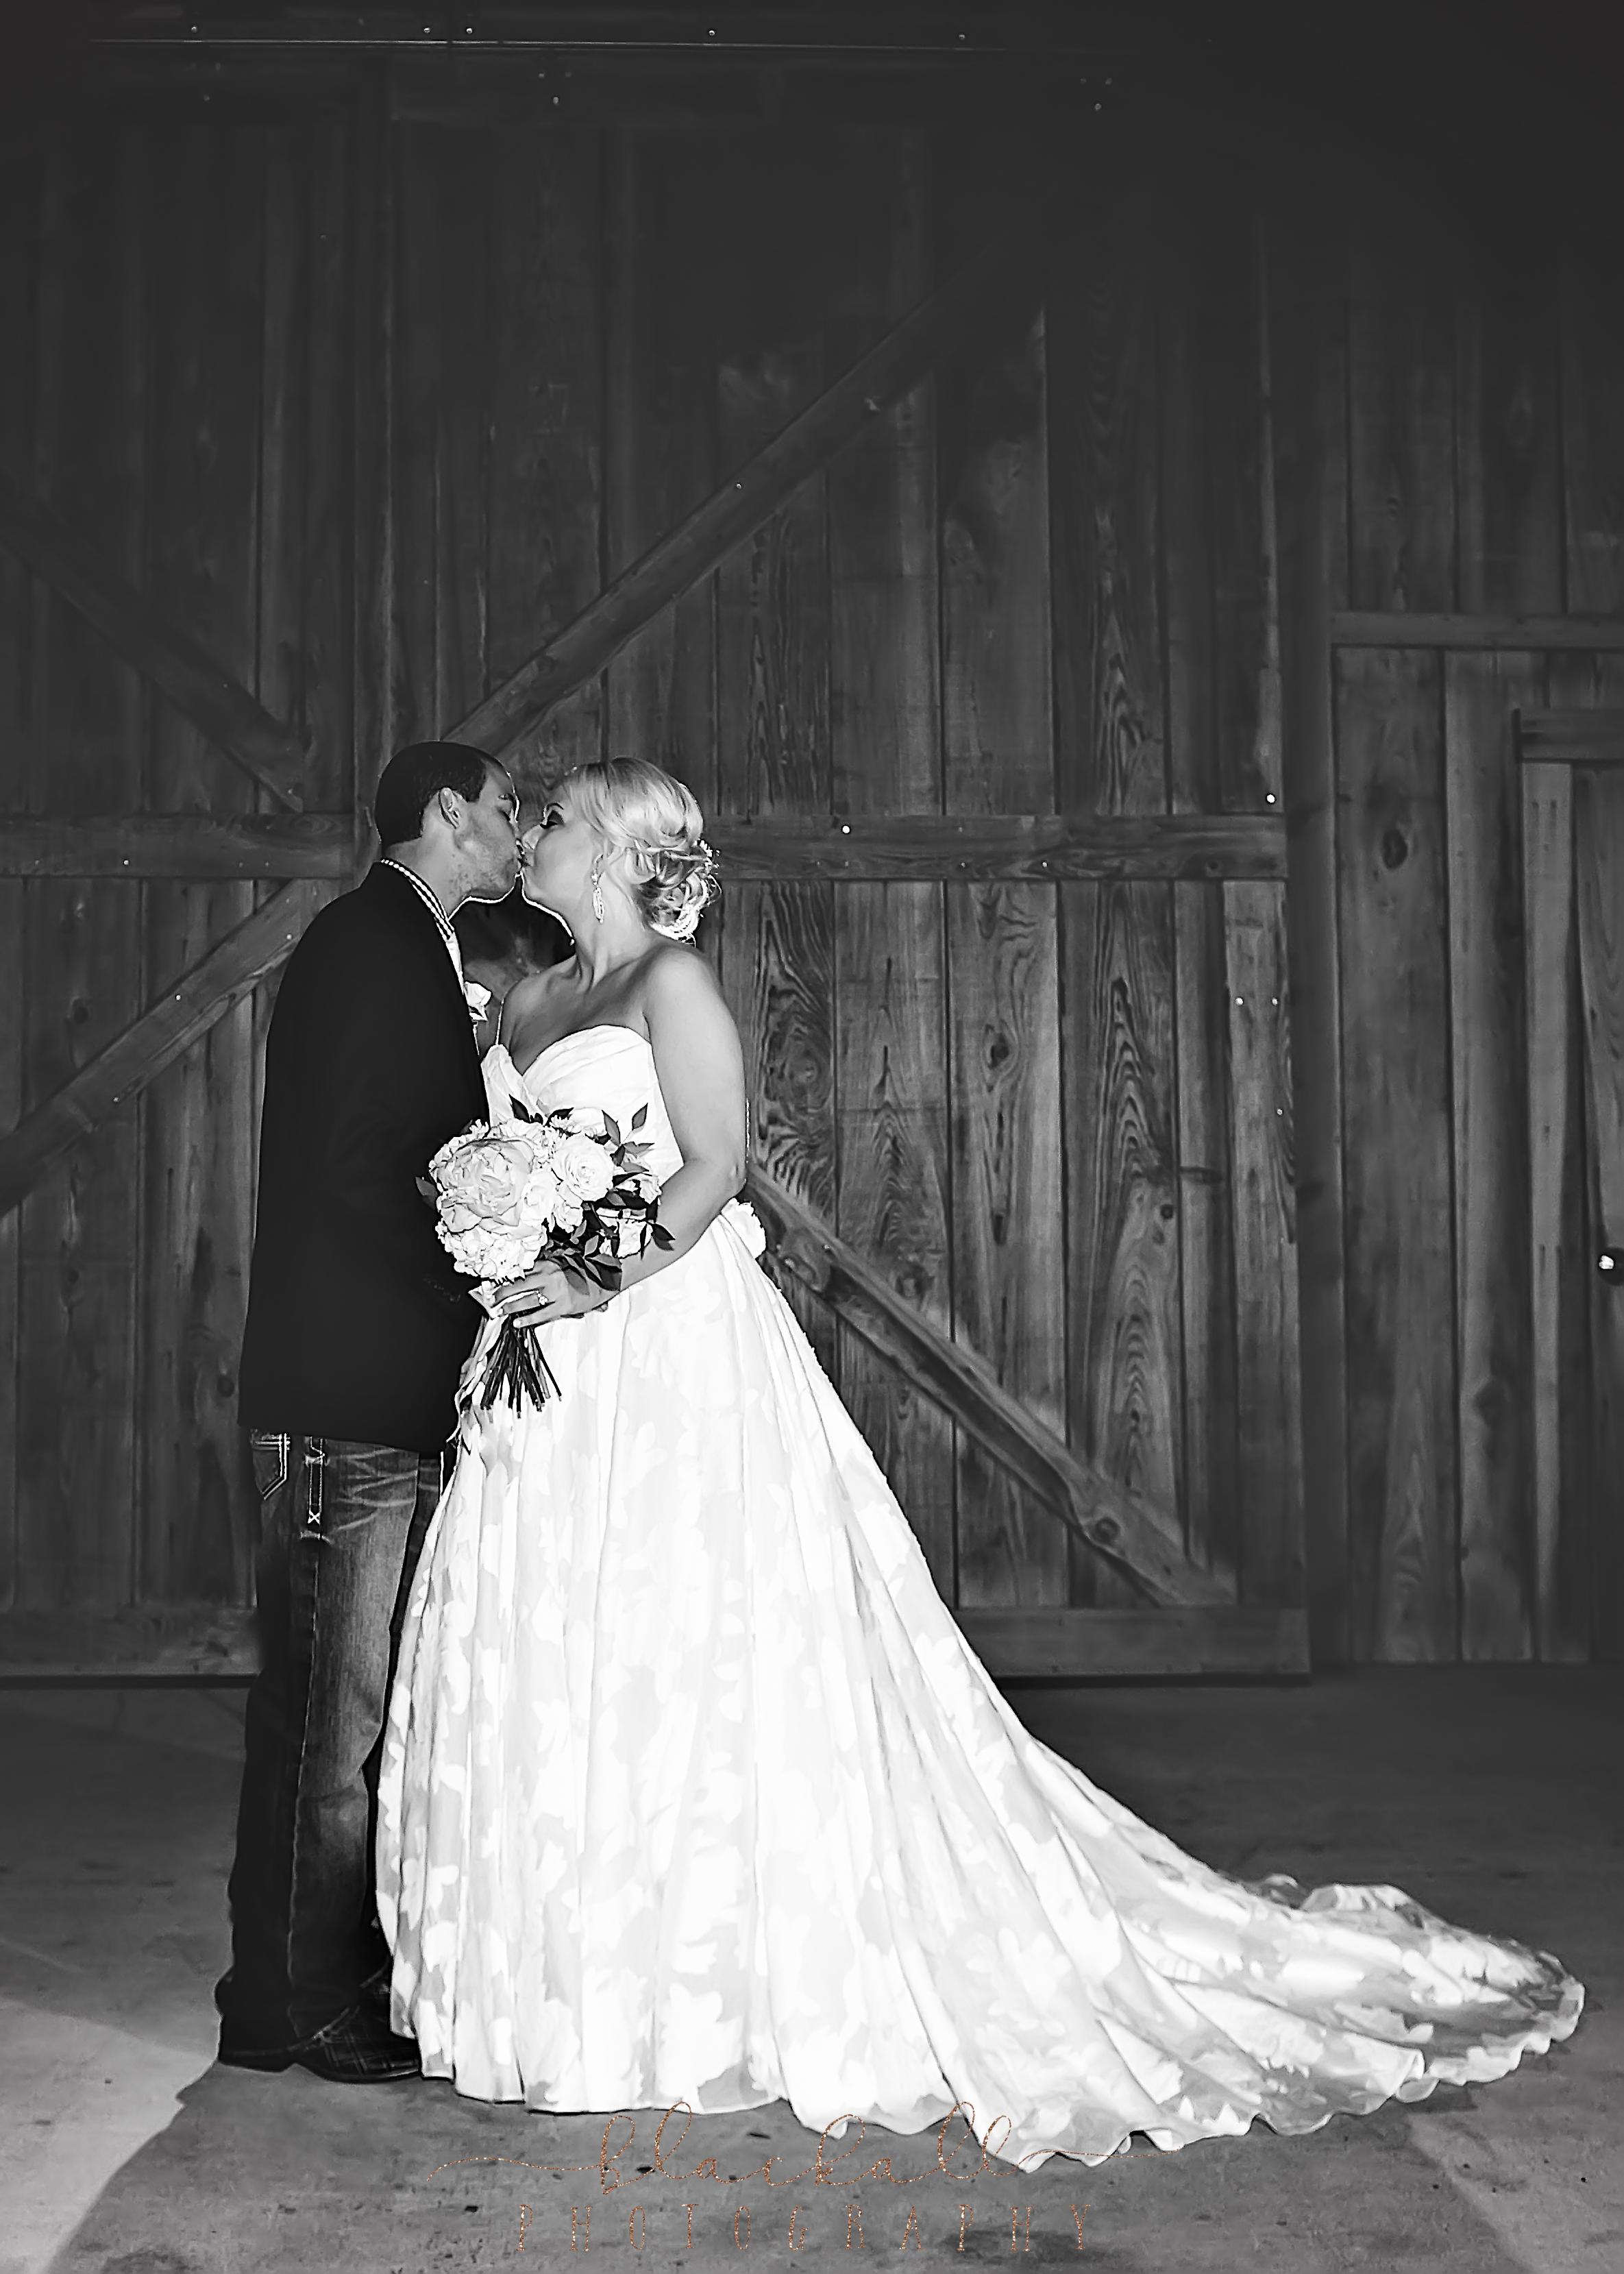 M&M WEDDING_Blackall Photography-46.JPG